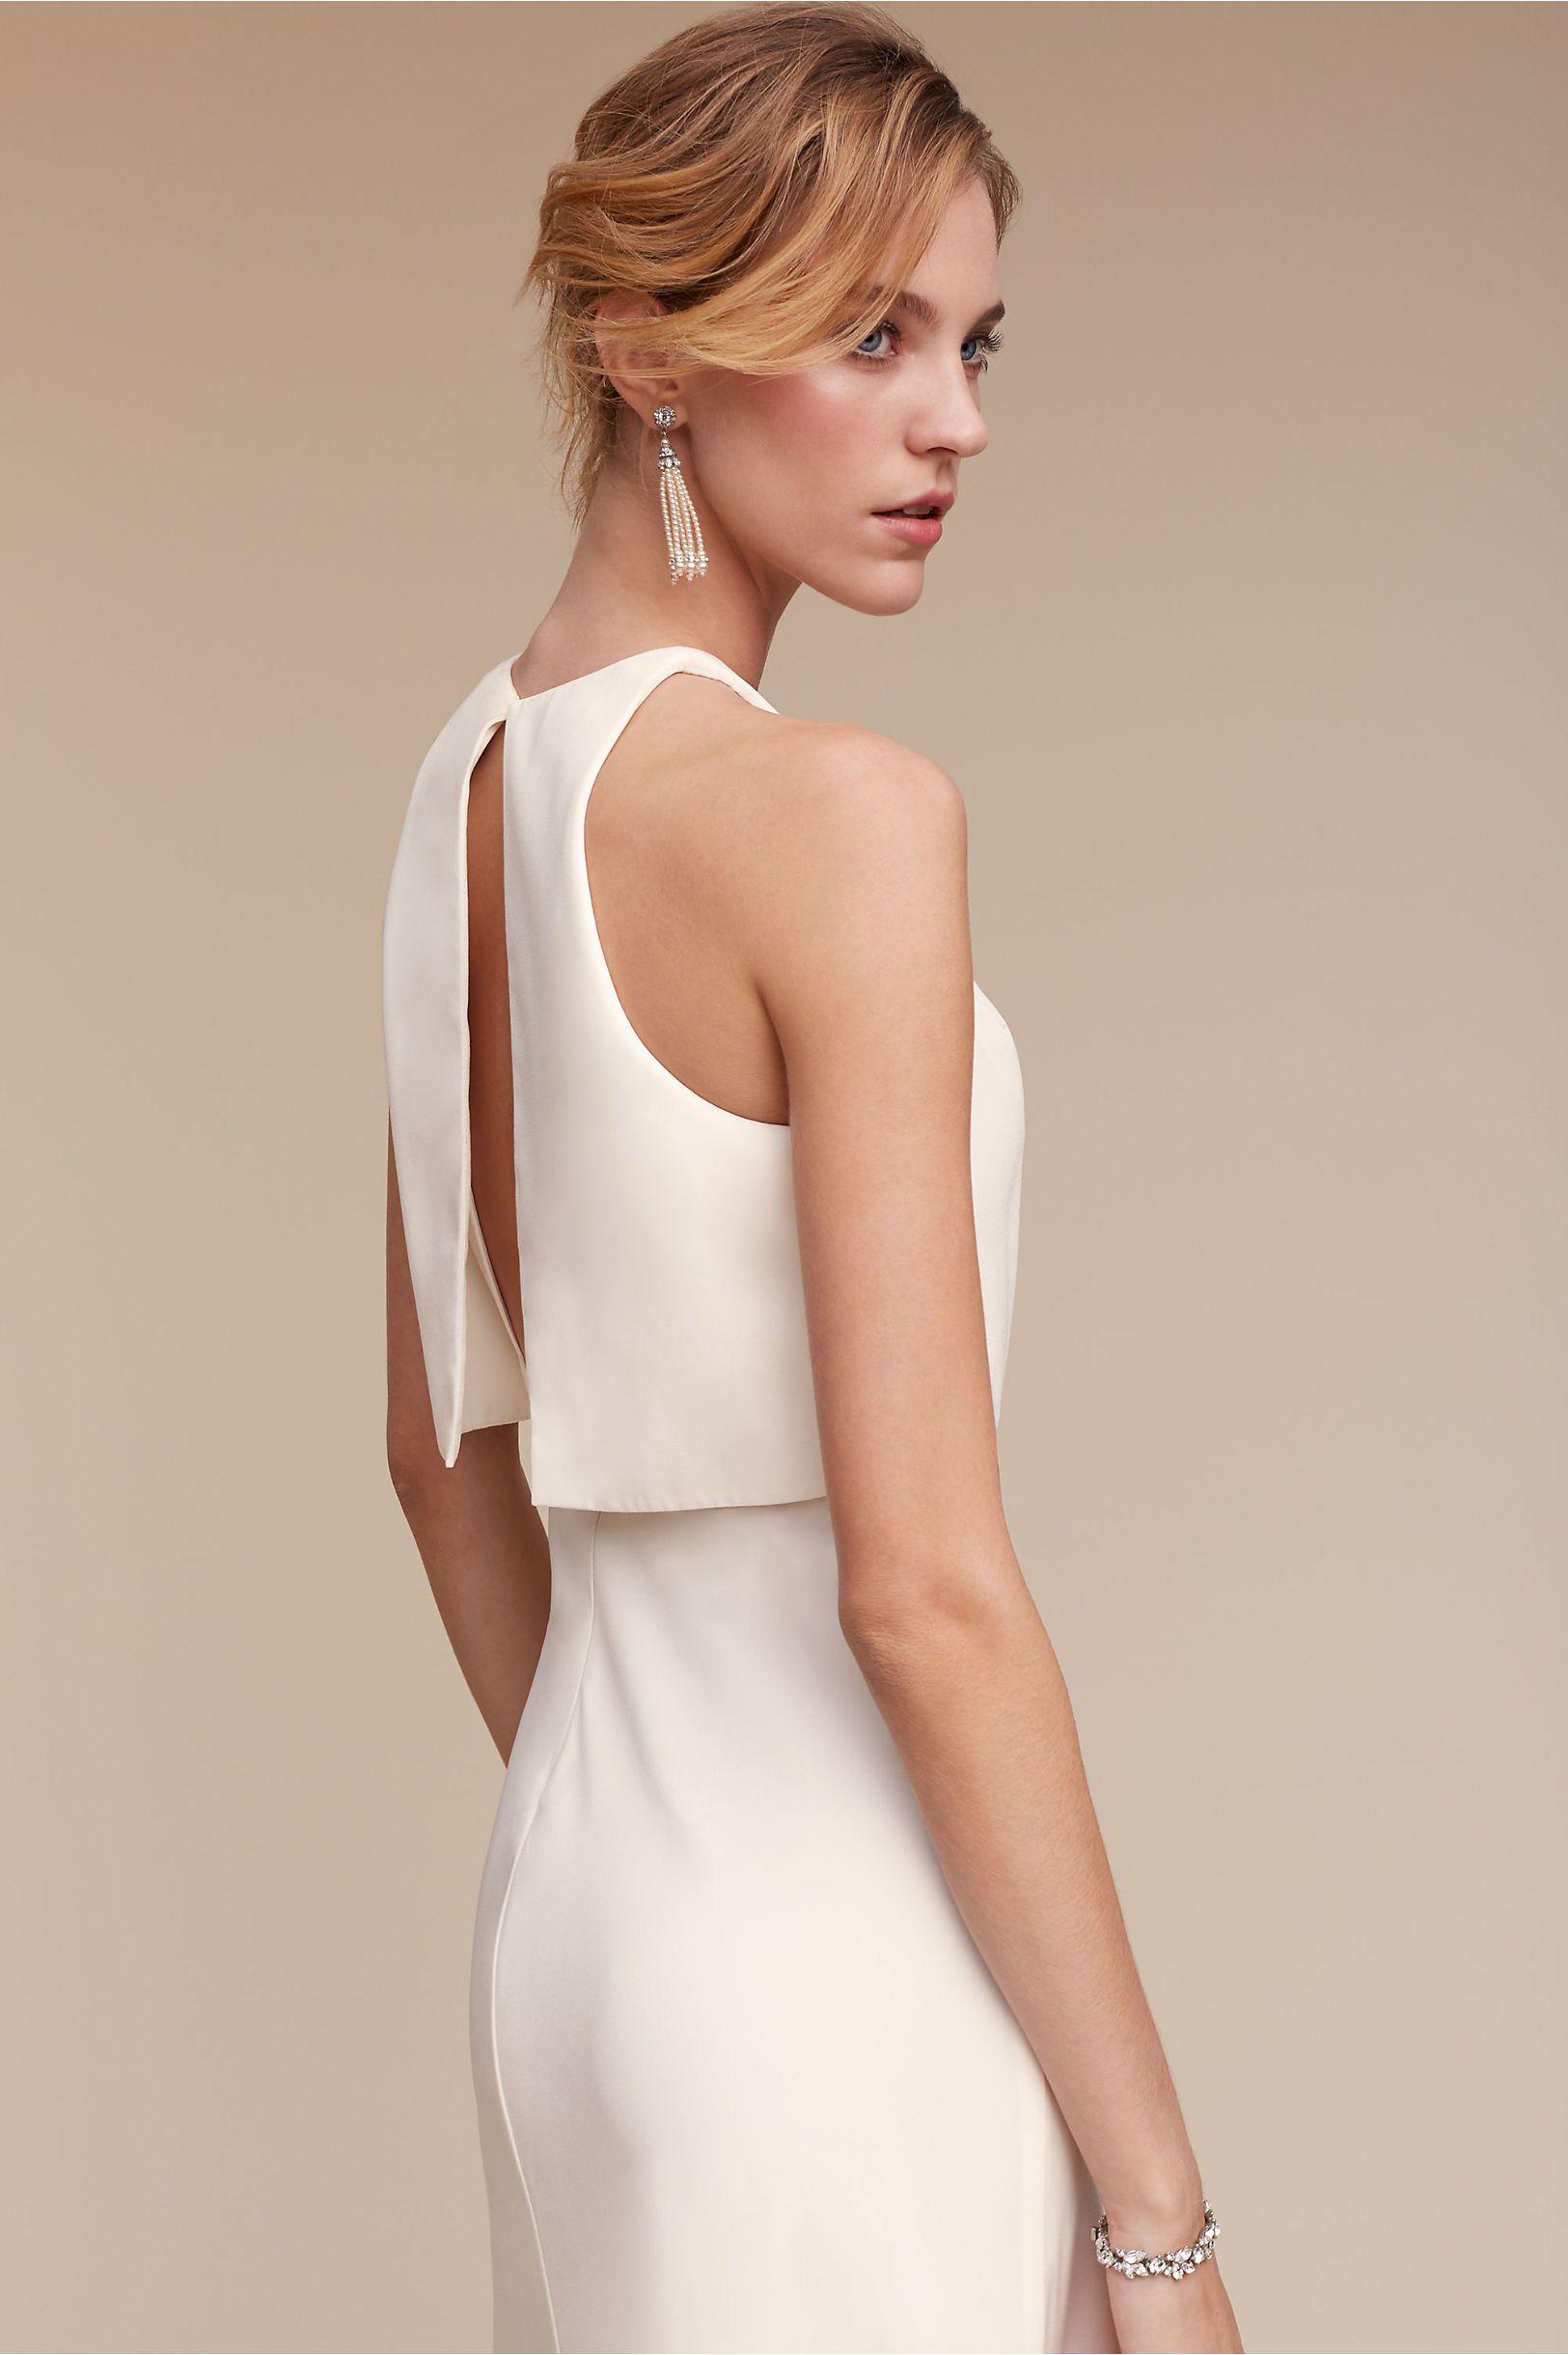 Iva Crepe Maxi | Crepes, Wedding dress and Rehearsal dress